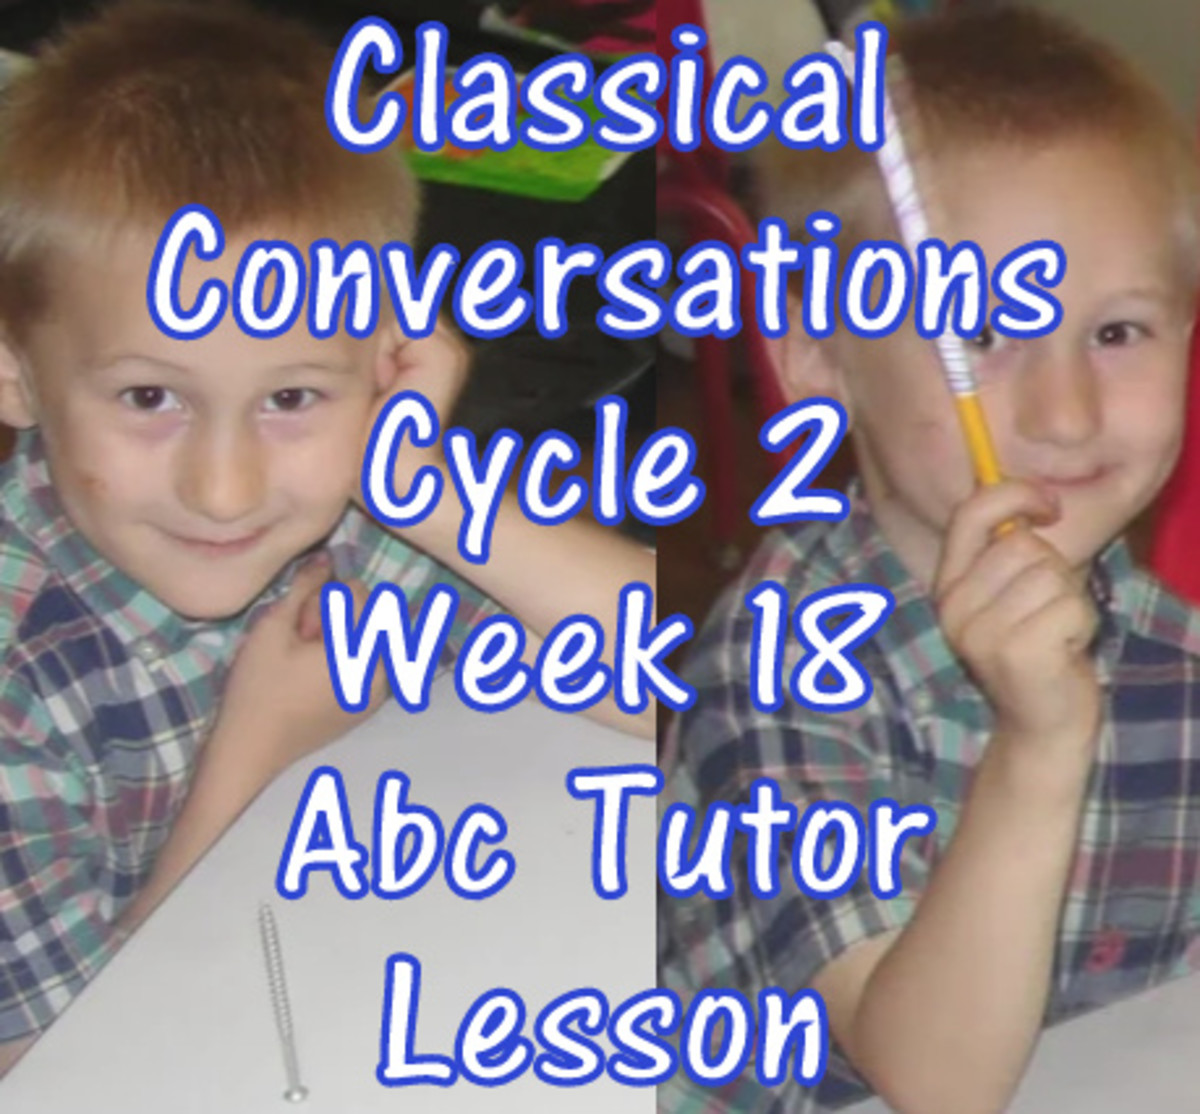 Cc Cycle 2 Week 18 Lesson For Abecedarian Tutors